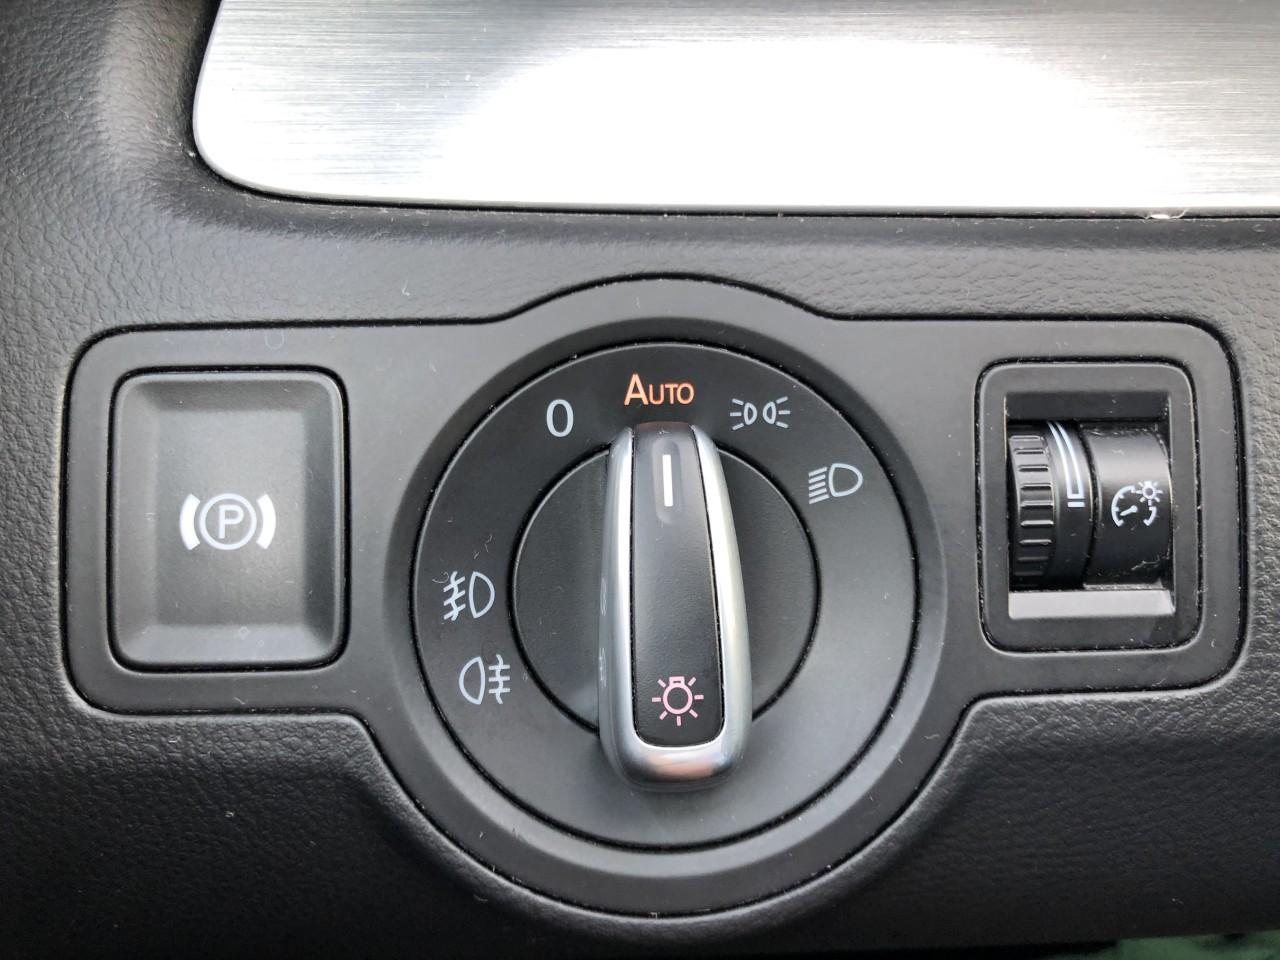 VW Passat CC PASSAT CC 170Cp/Webasto/Bi-XENON/Lane Assist/ACC si Front Assist/Dynaudio/Suspensie adaptiva/Park Assist/Navi/Scaune ventilate/Senzori PDC Fata/Carlig remorcare/,etc... 2010